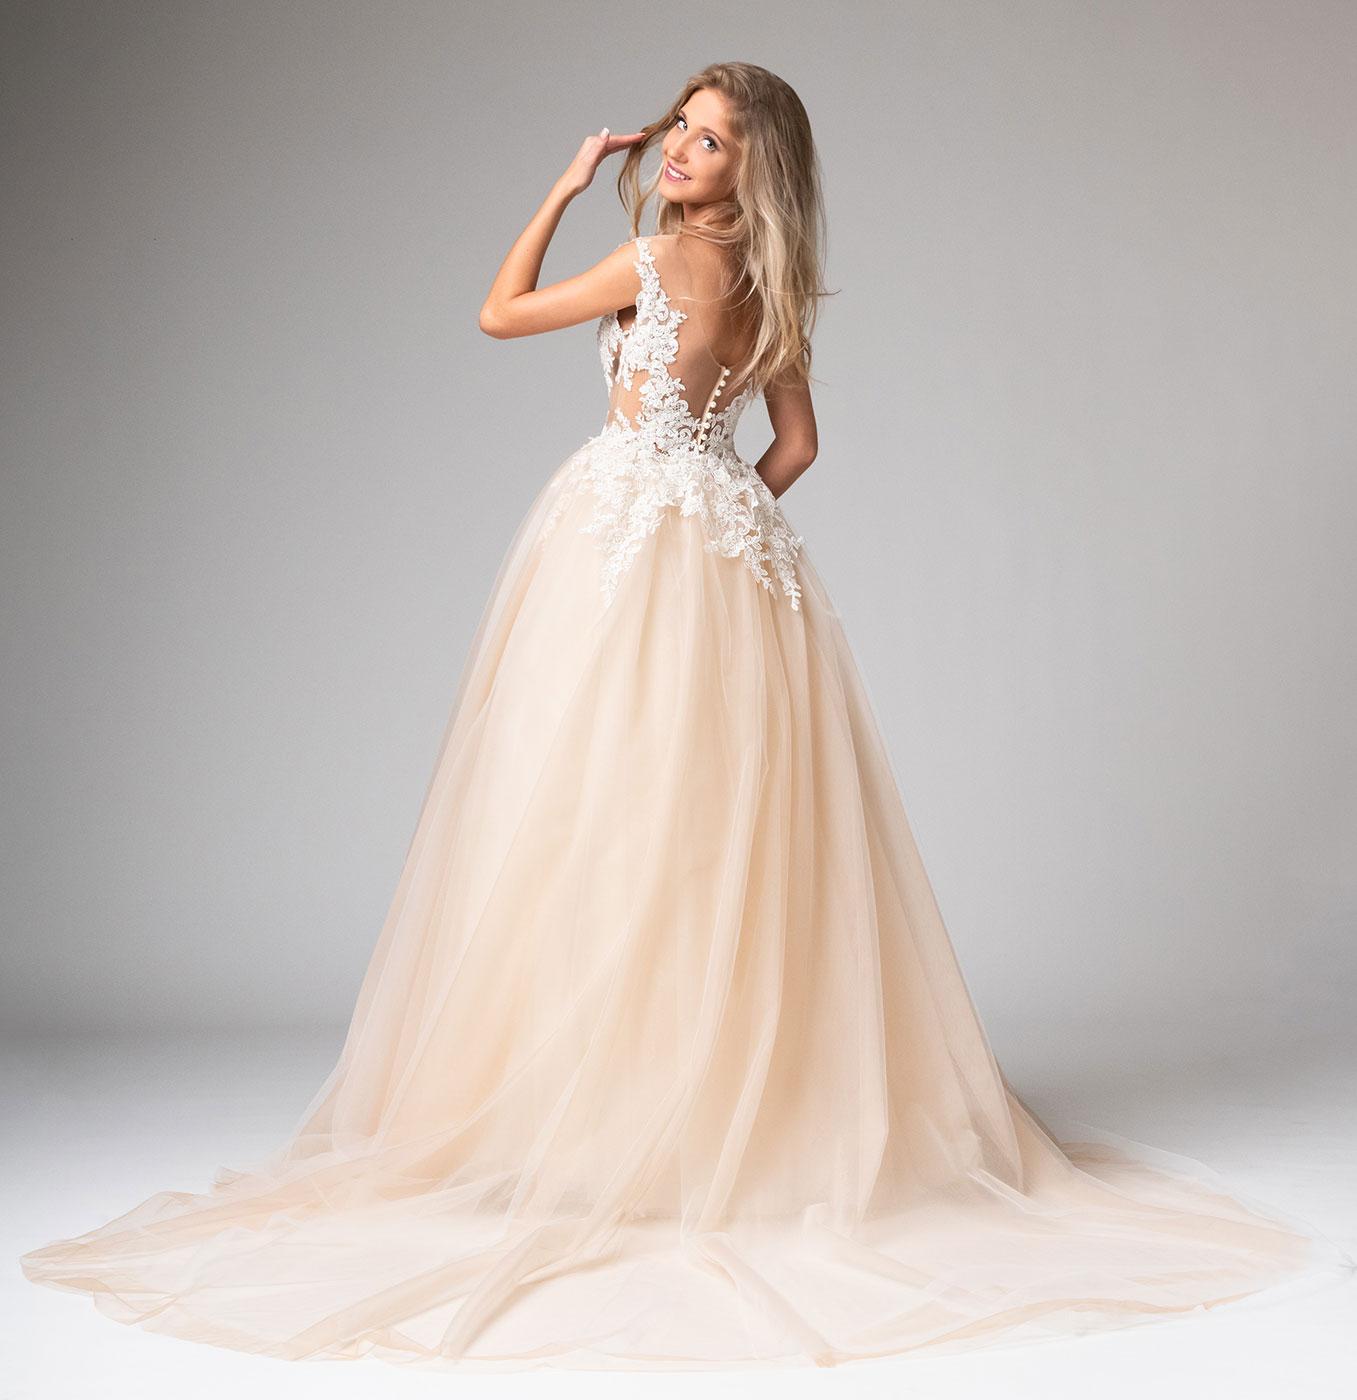 Tüll Brautkleid mit abnehmbarer Schleppe Maßanfertigung